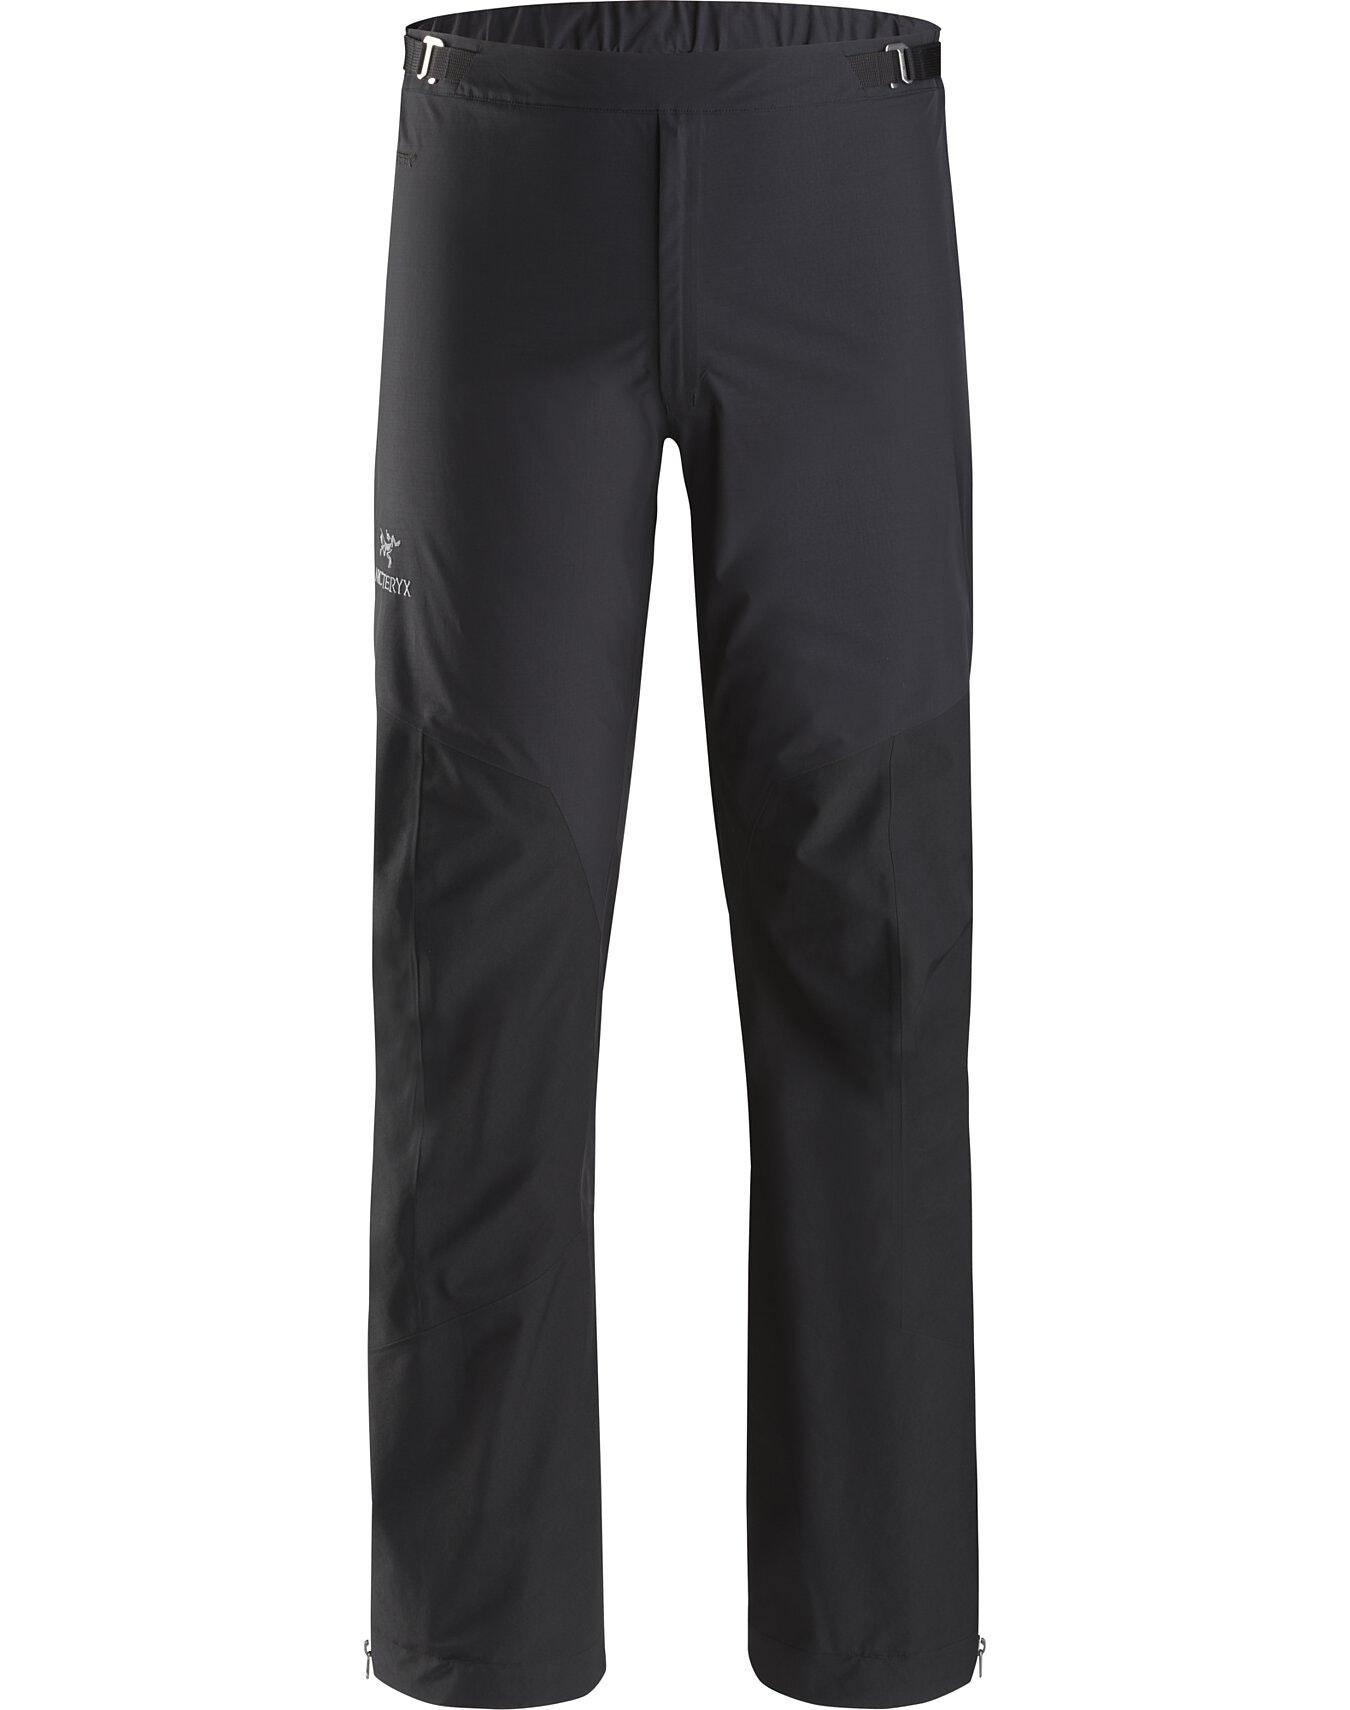 Beta SL Pant Black